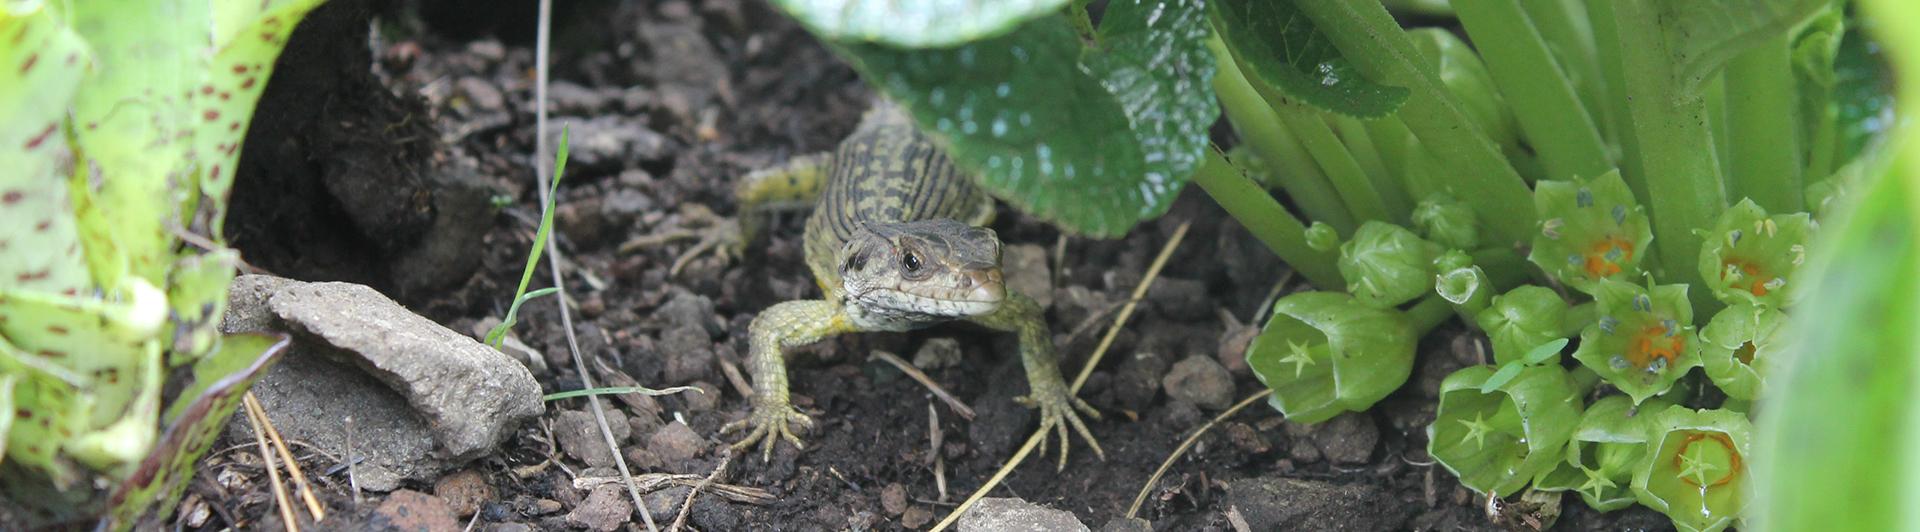 Lizard Polinates